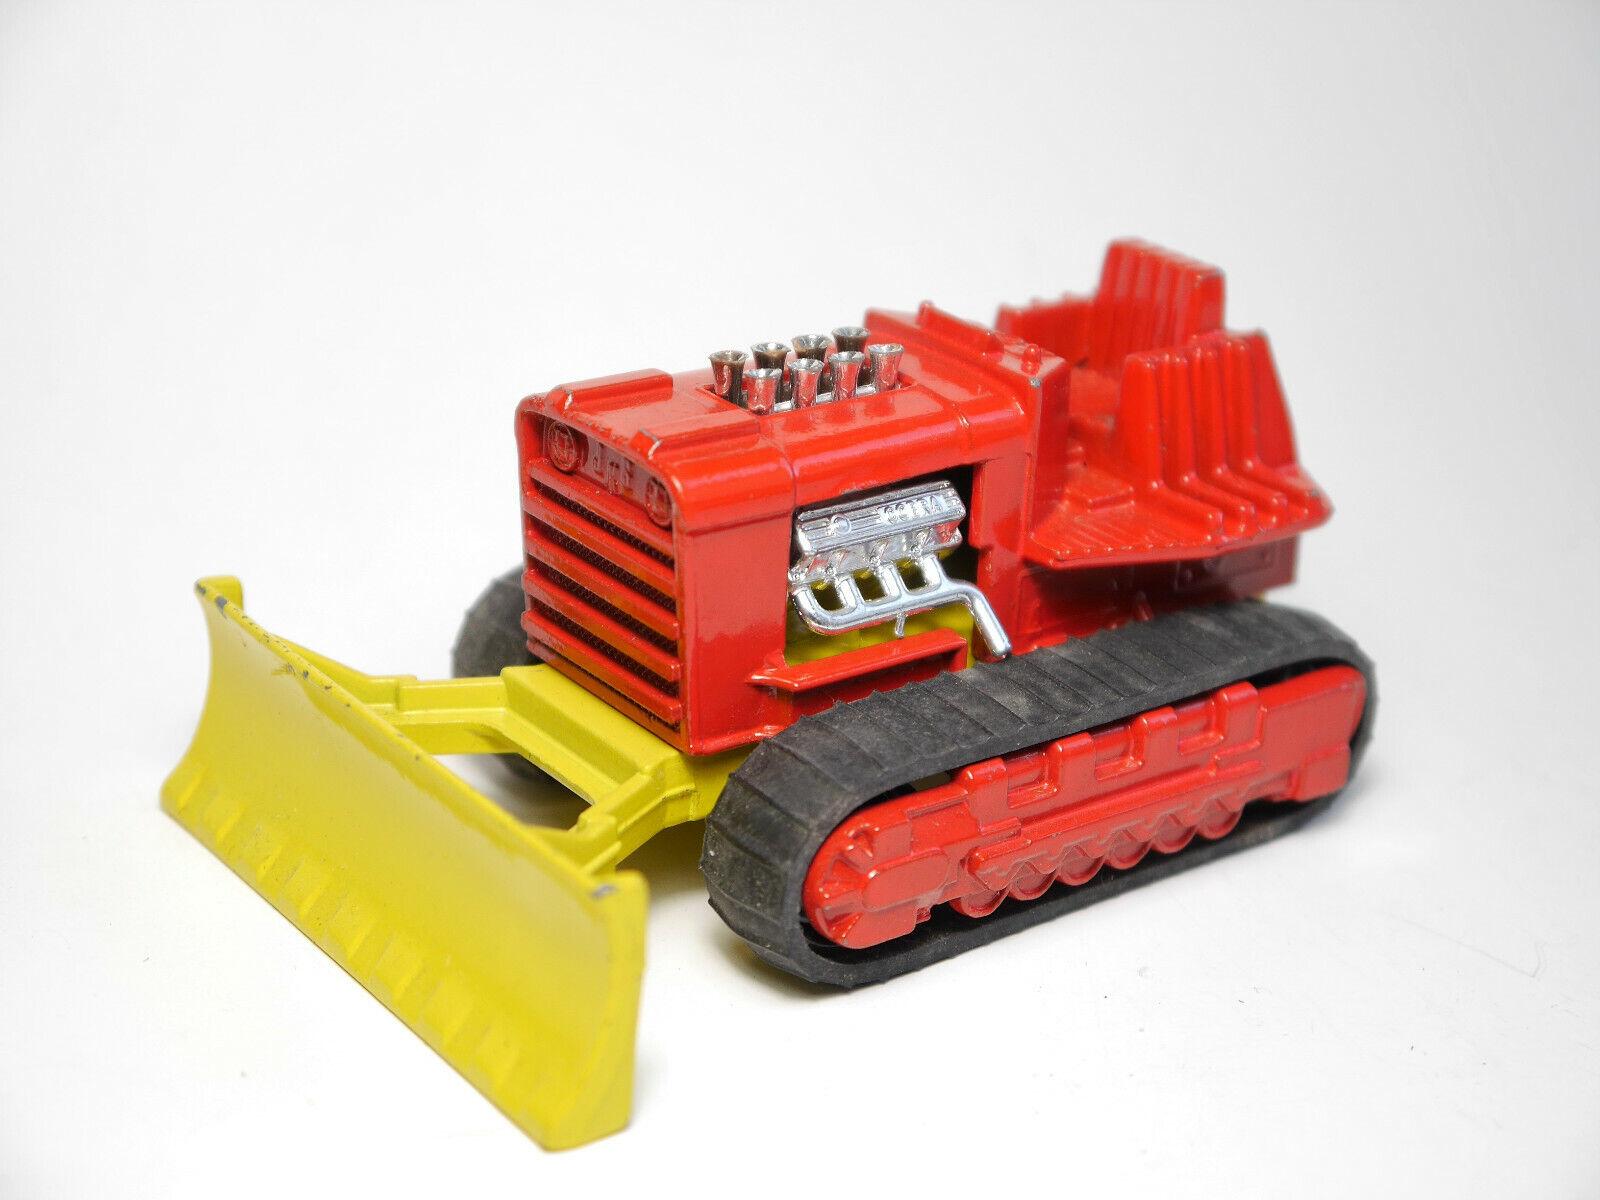 Chenille Tractor Bull Bull Bull CATERPILLAR unicellulaire Super Bulldozer, Matchbox King Taille k-23 4d155b